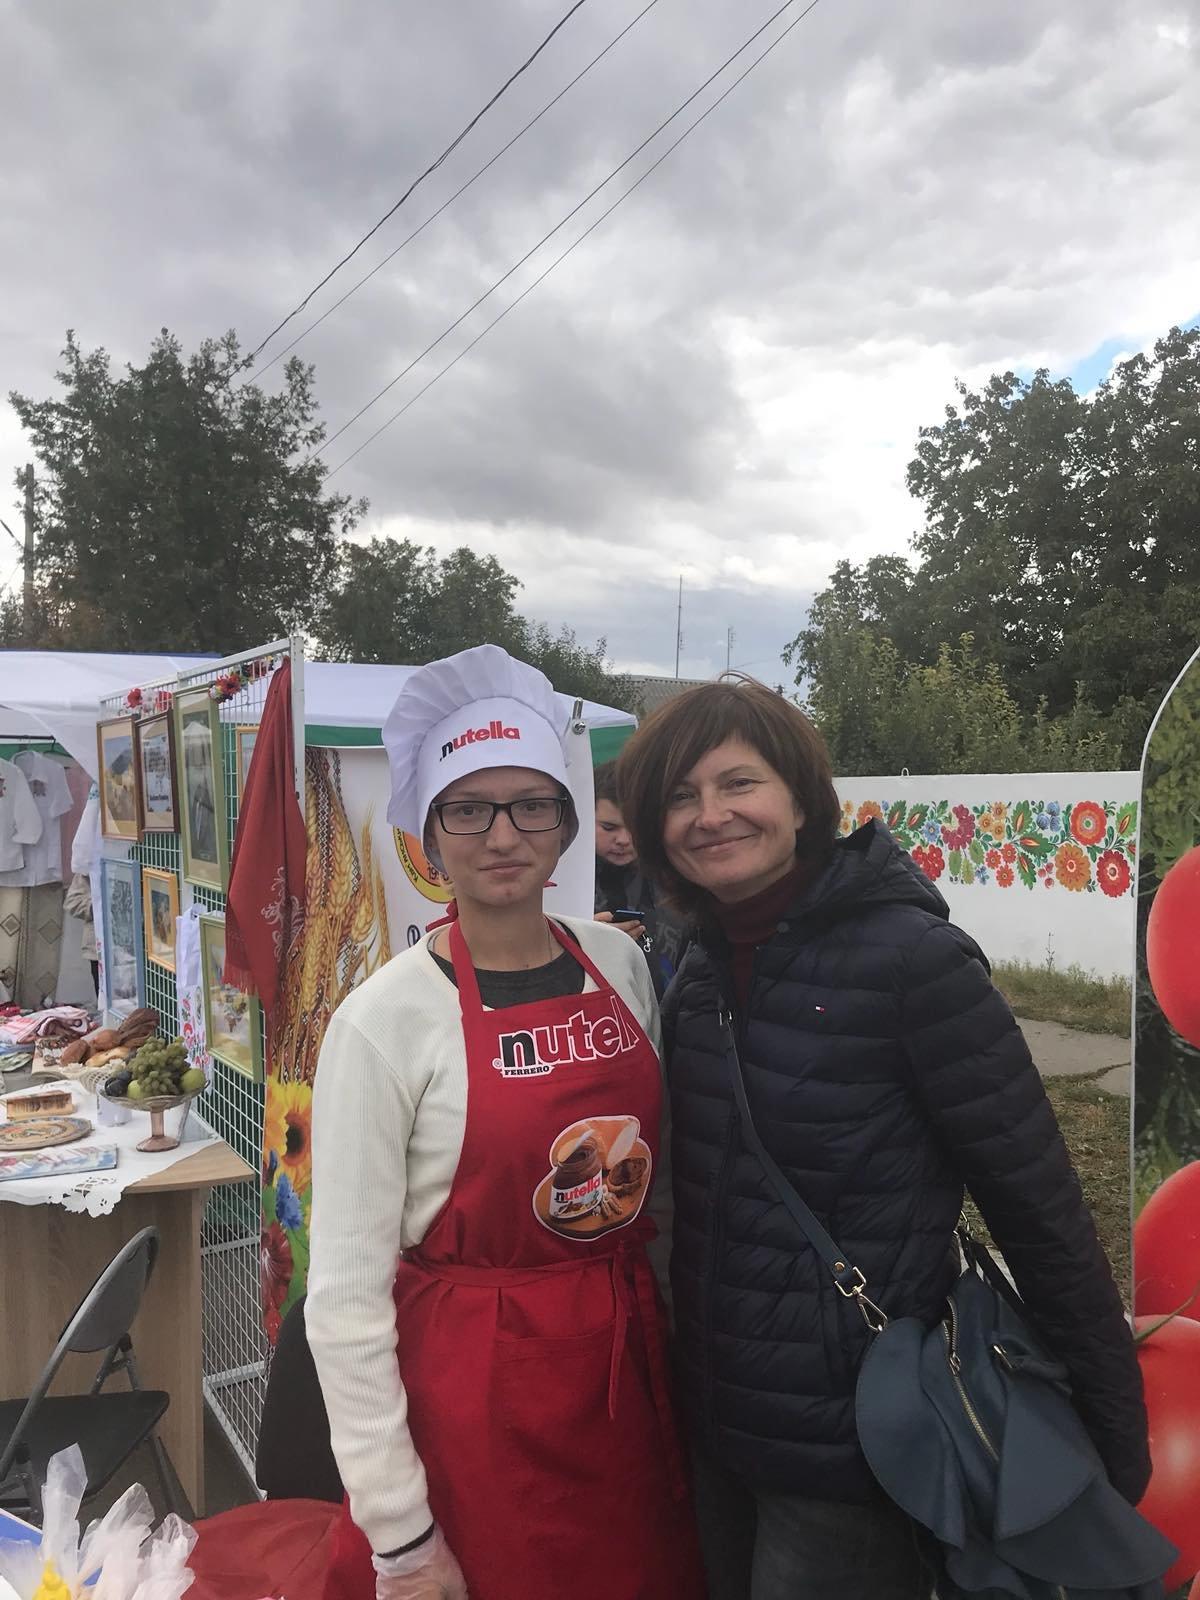 Каменчане заняли первое место на фестивале «Петриковский дивоцвит-2019», фото-3